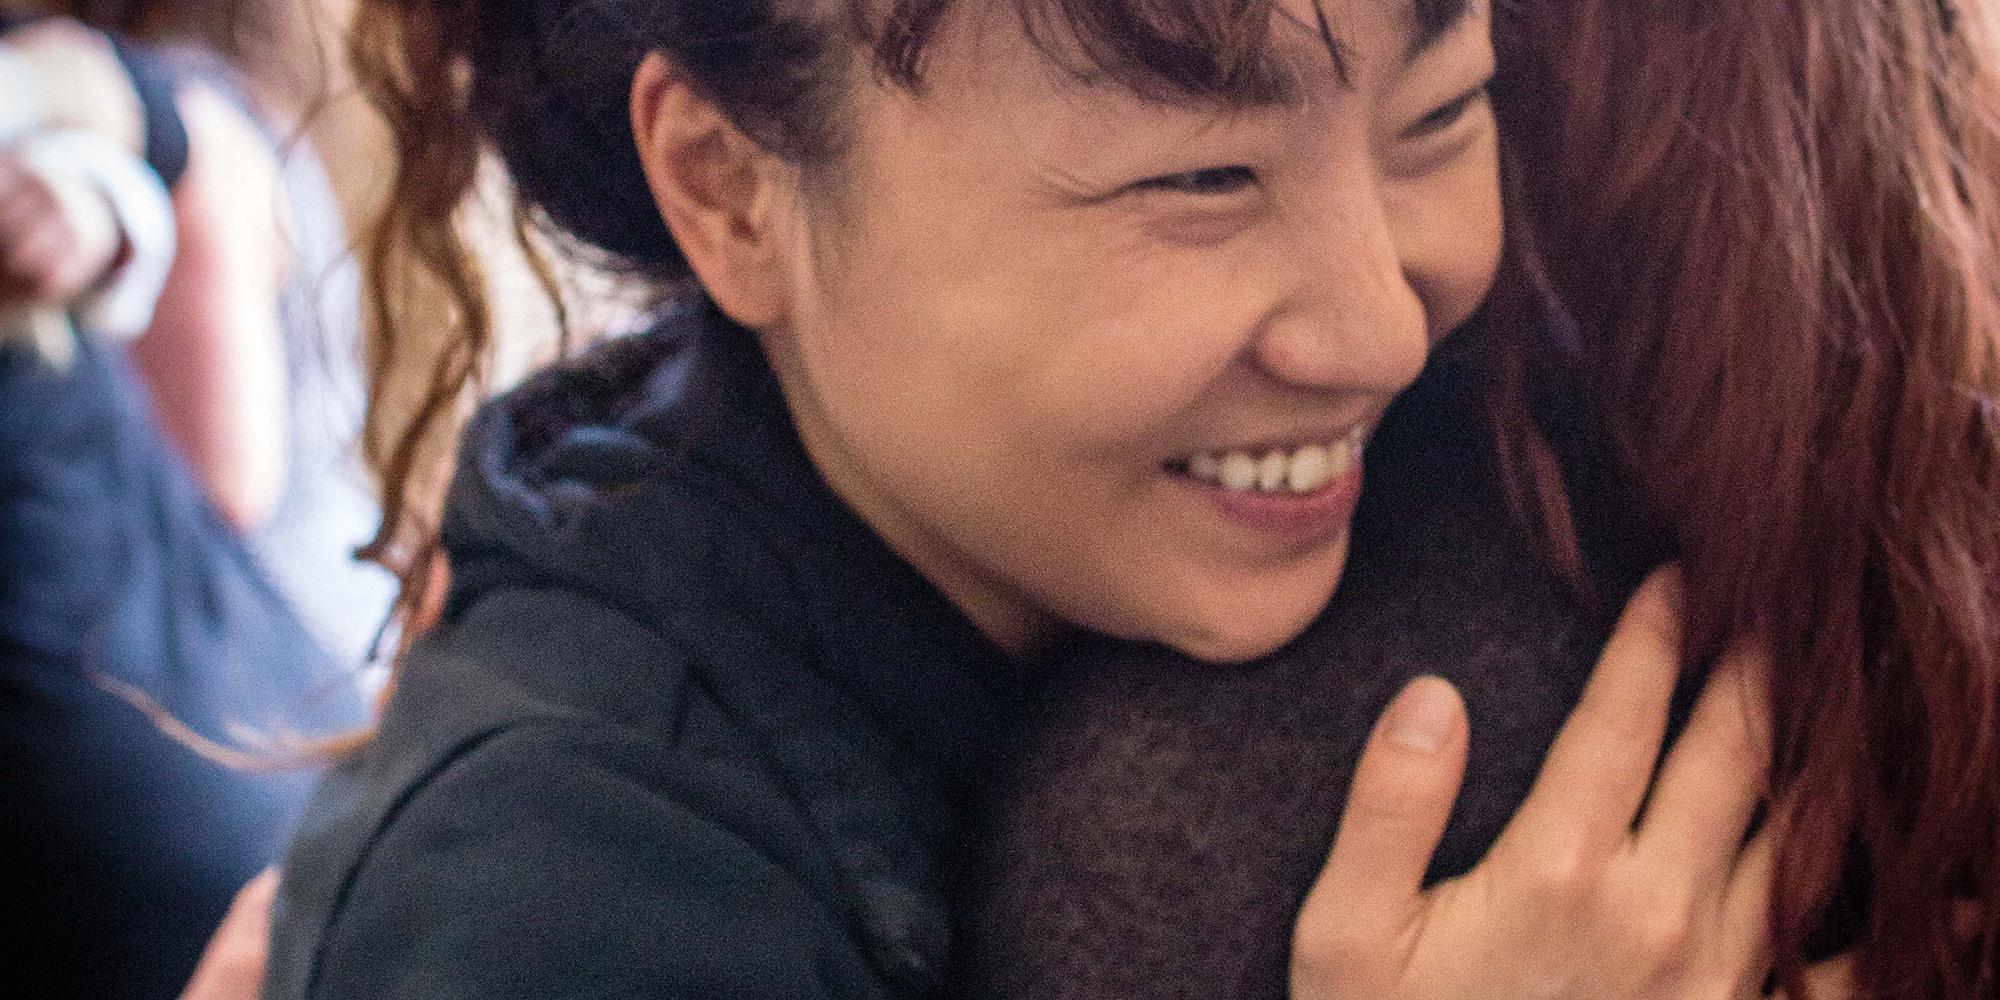 Elizabeth Fry Toronto Women in prison Women marginalization justice and equity for women